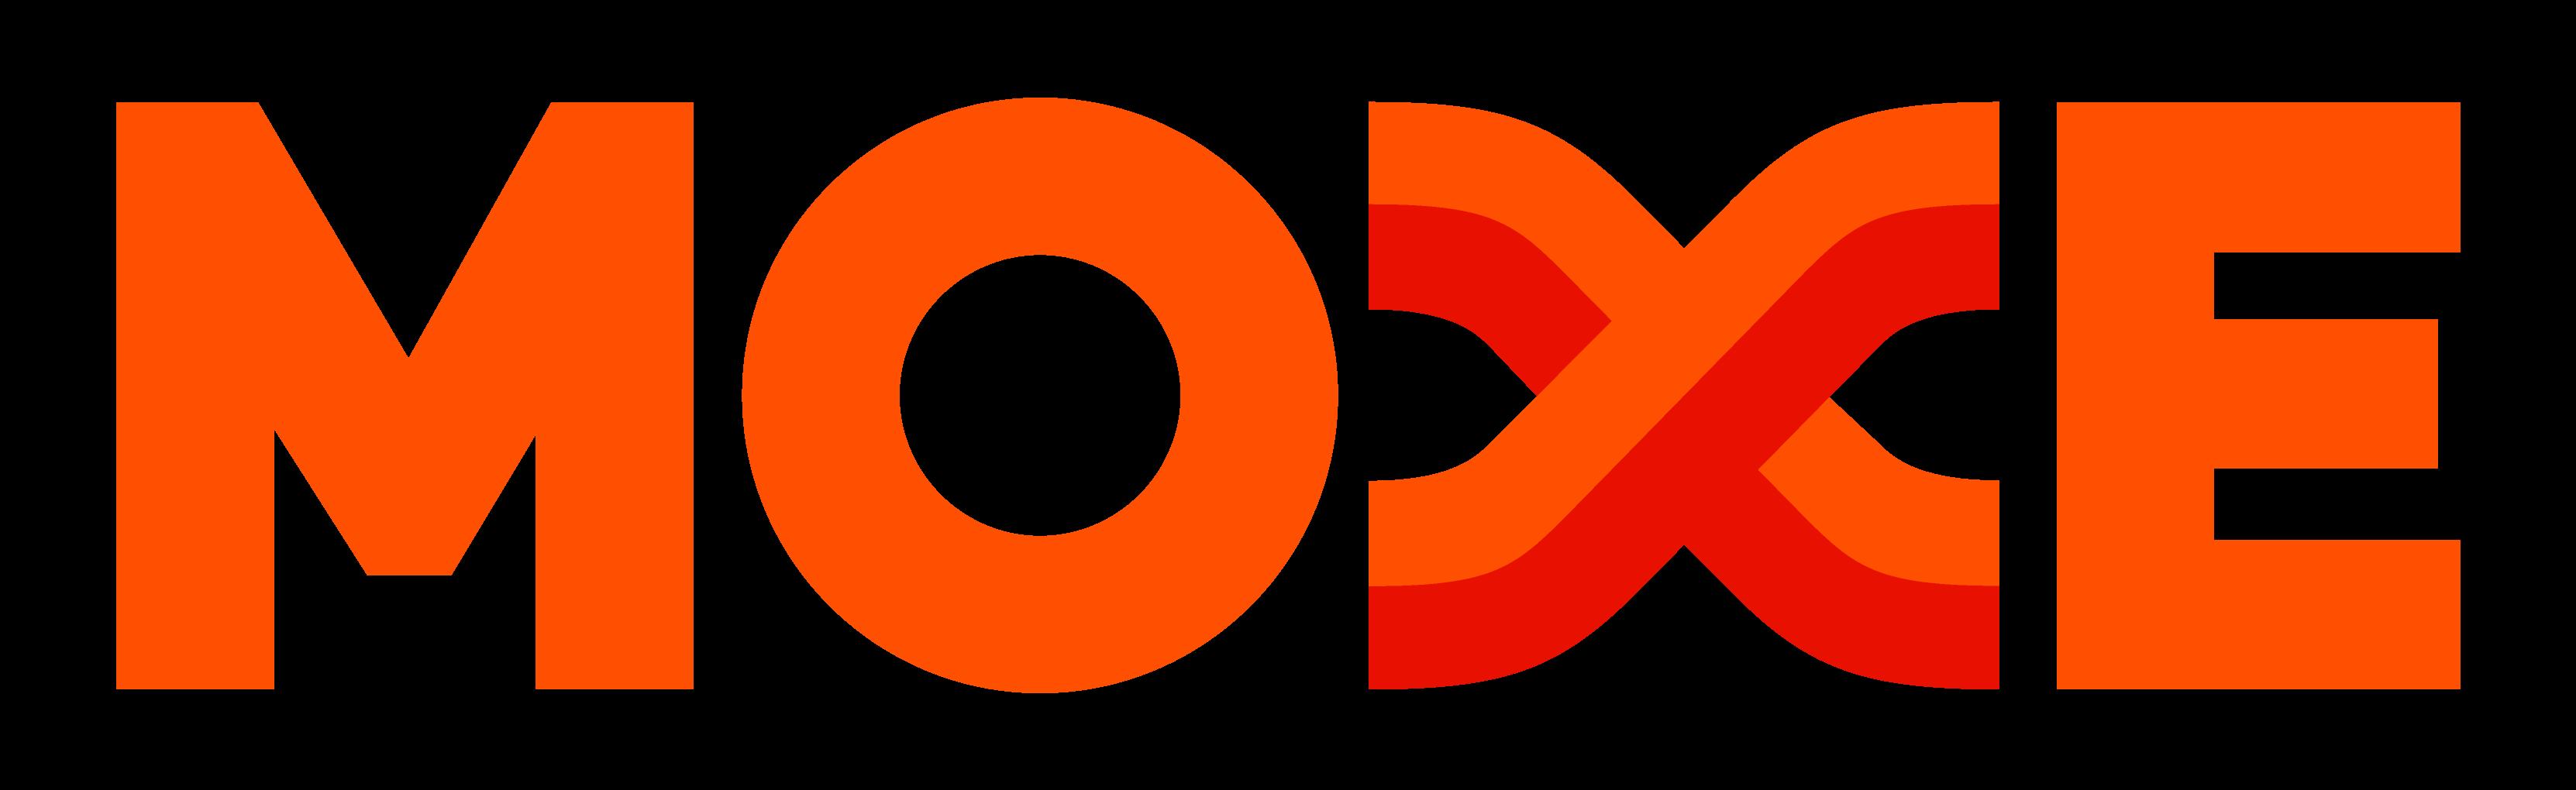 Moxe Health Corporation